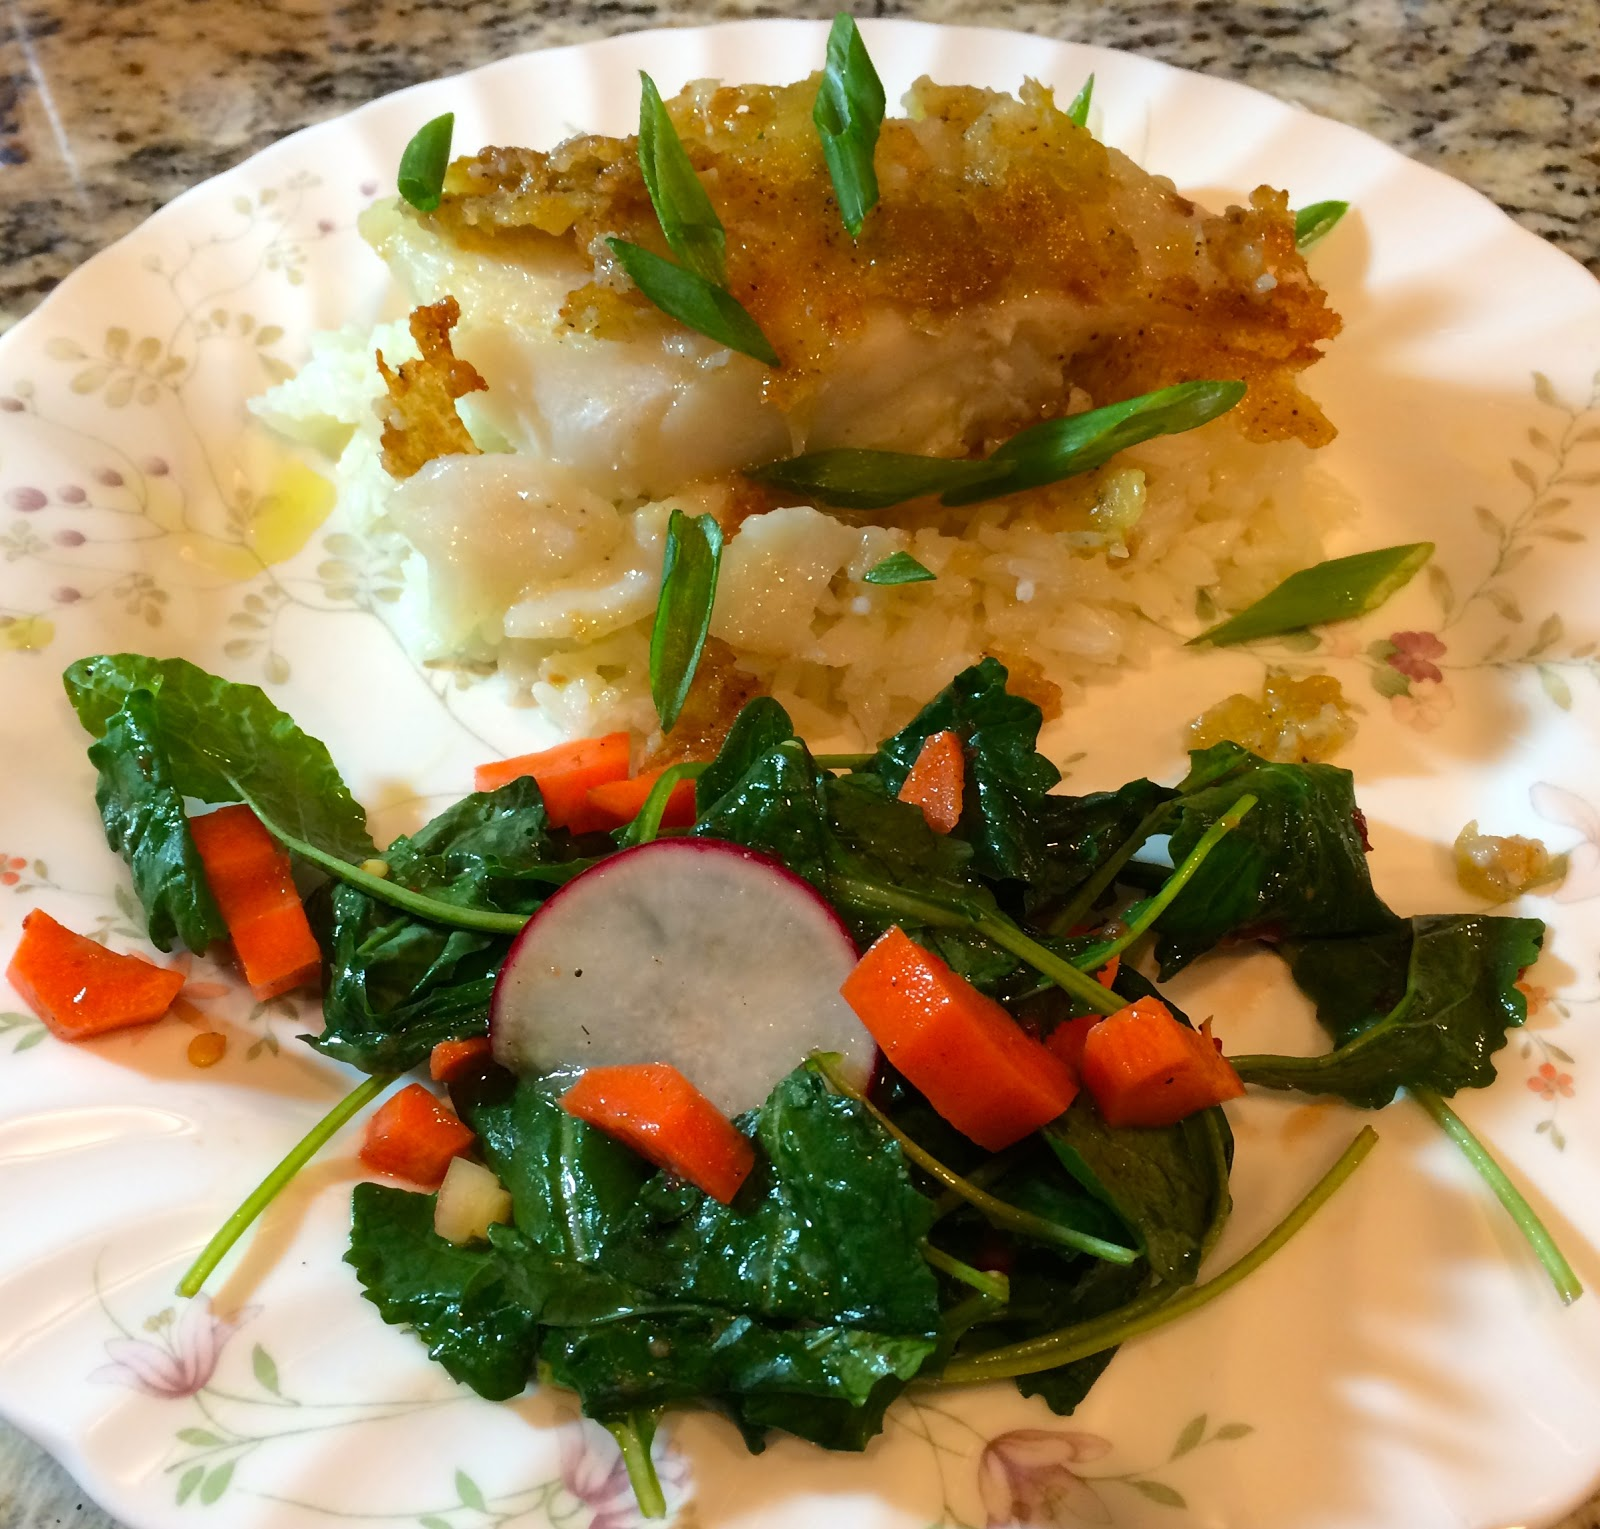 Blue apron tempura cod - Tempura Fried Cod With Thai Style Vegetable Salad Jasmine Rice